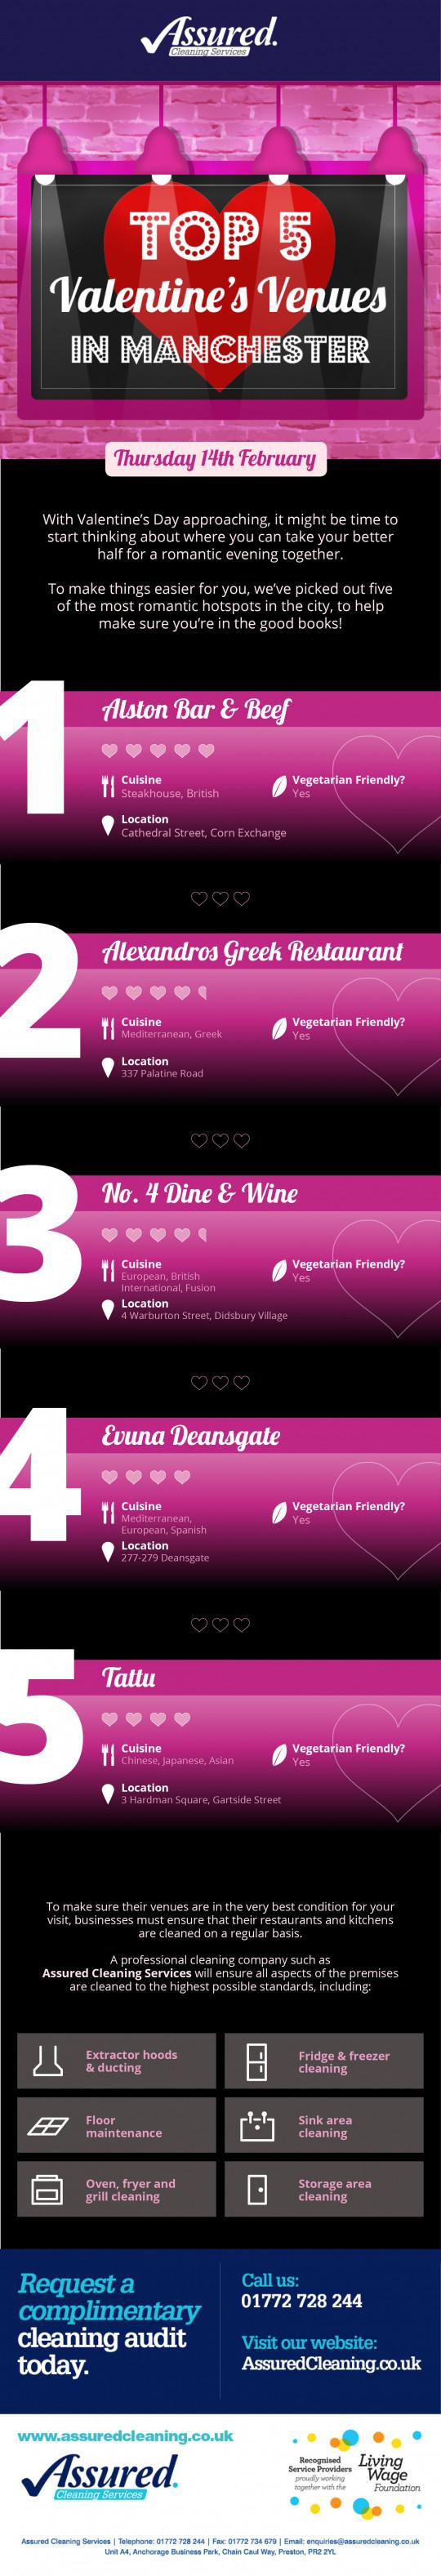 Top 5 Valentine